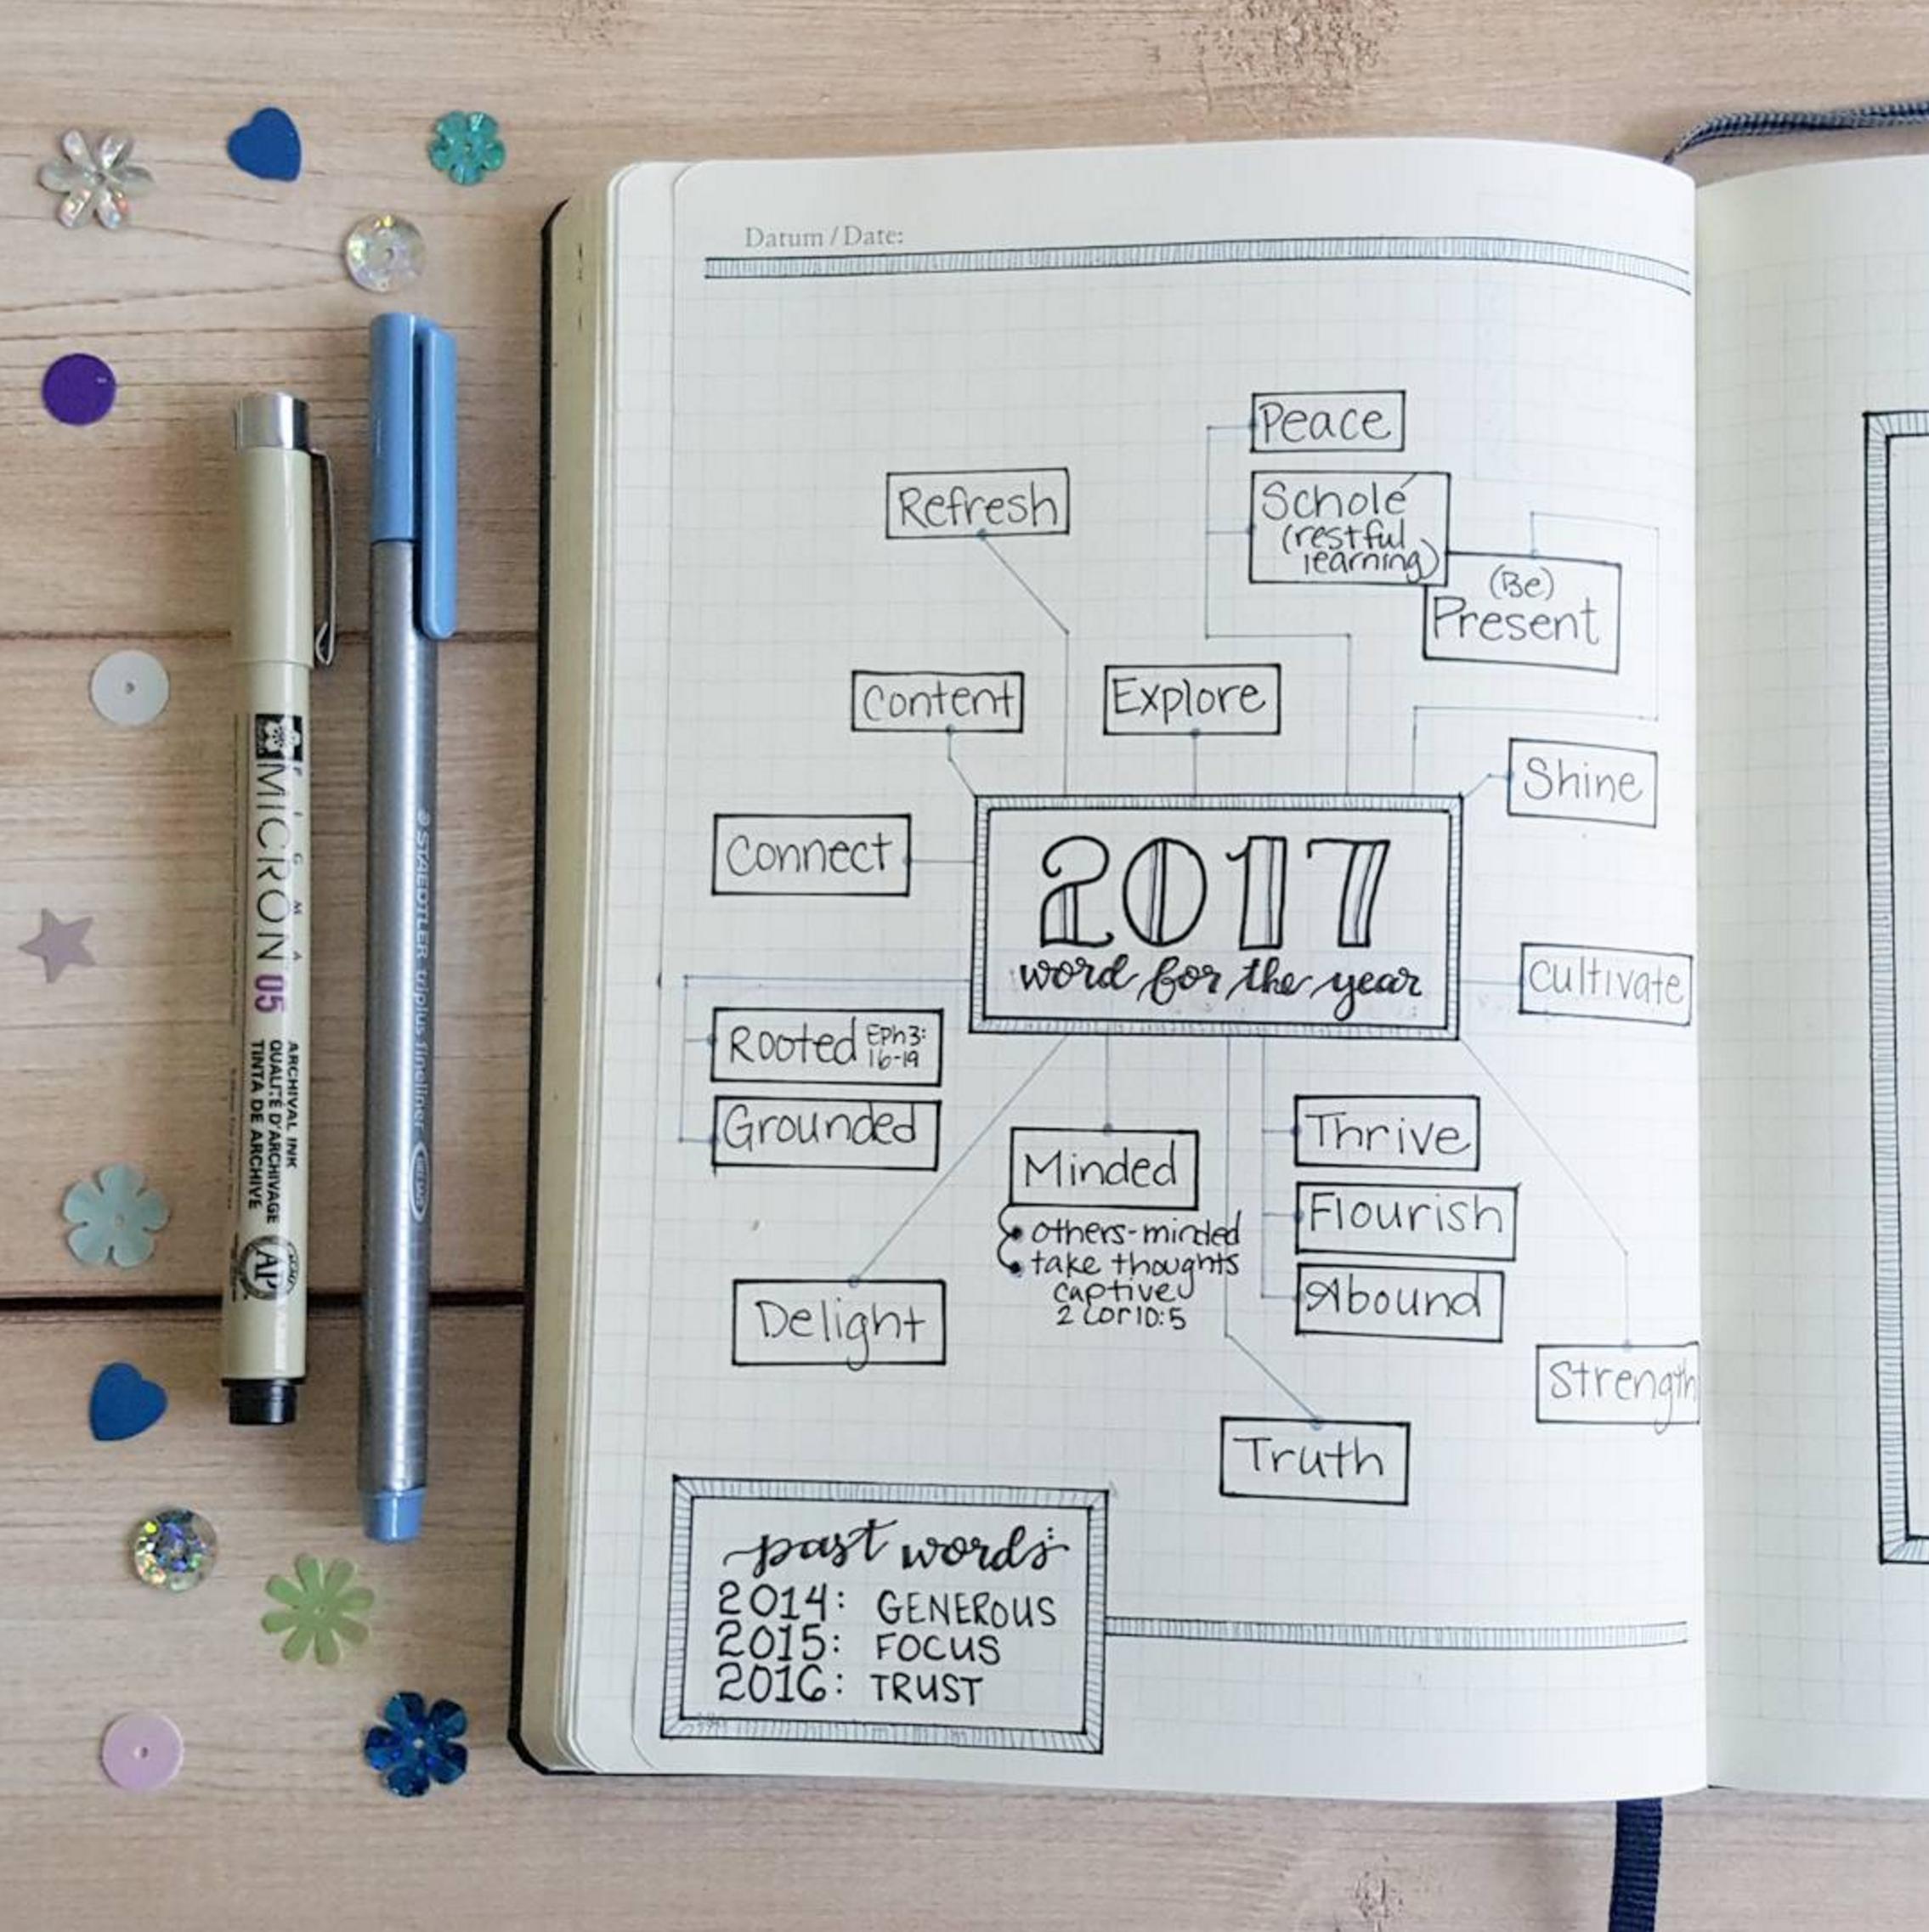 Lovely 2017 mindmap by  @oak.tree.journaling